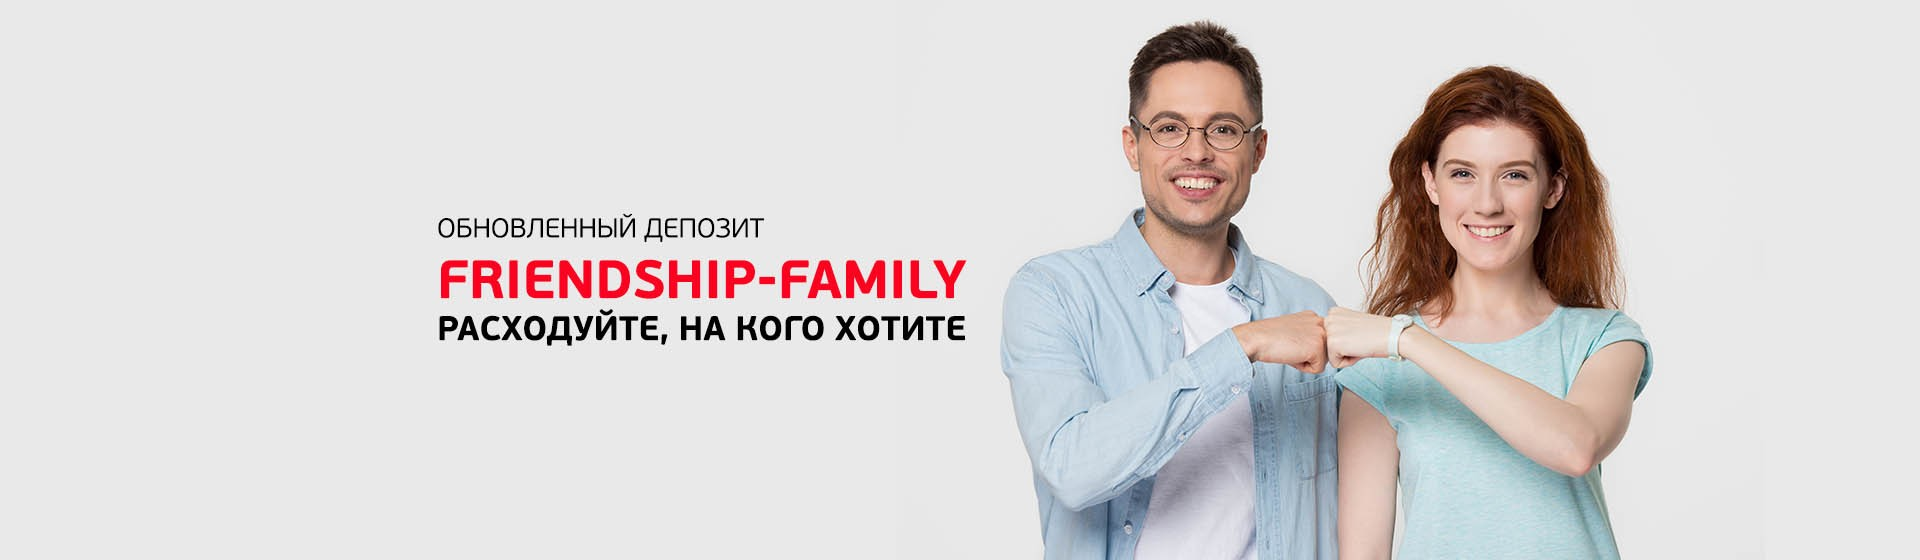 депозит Friendship-Family